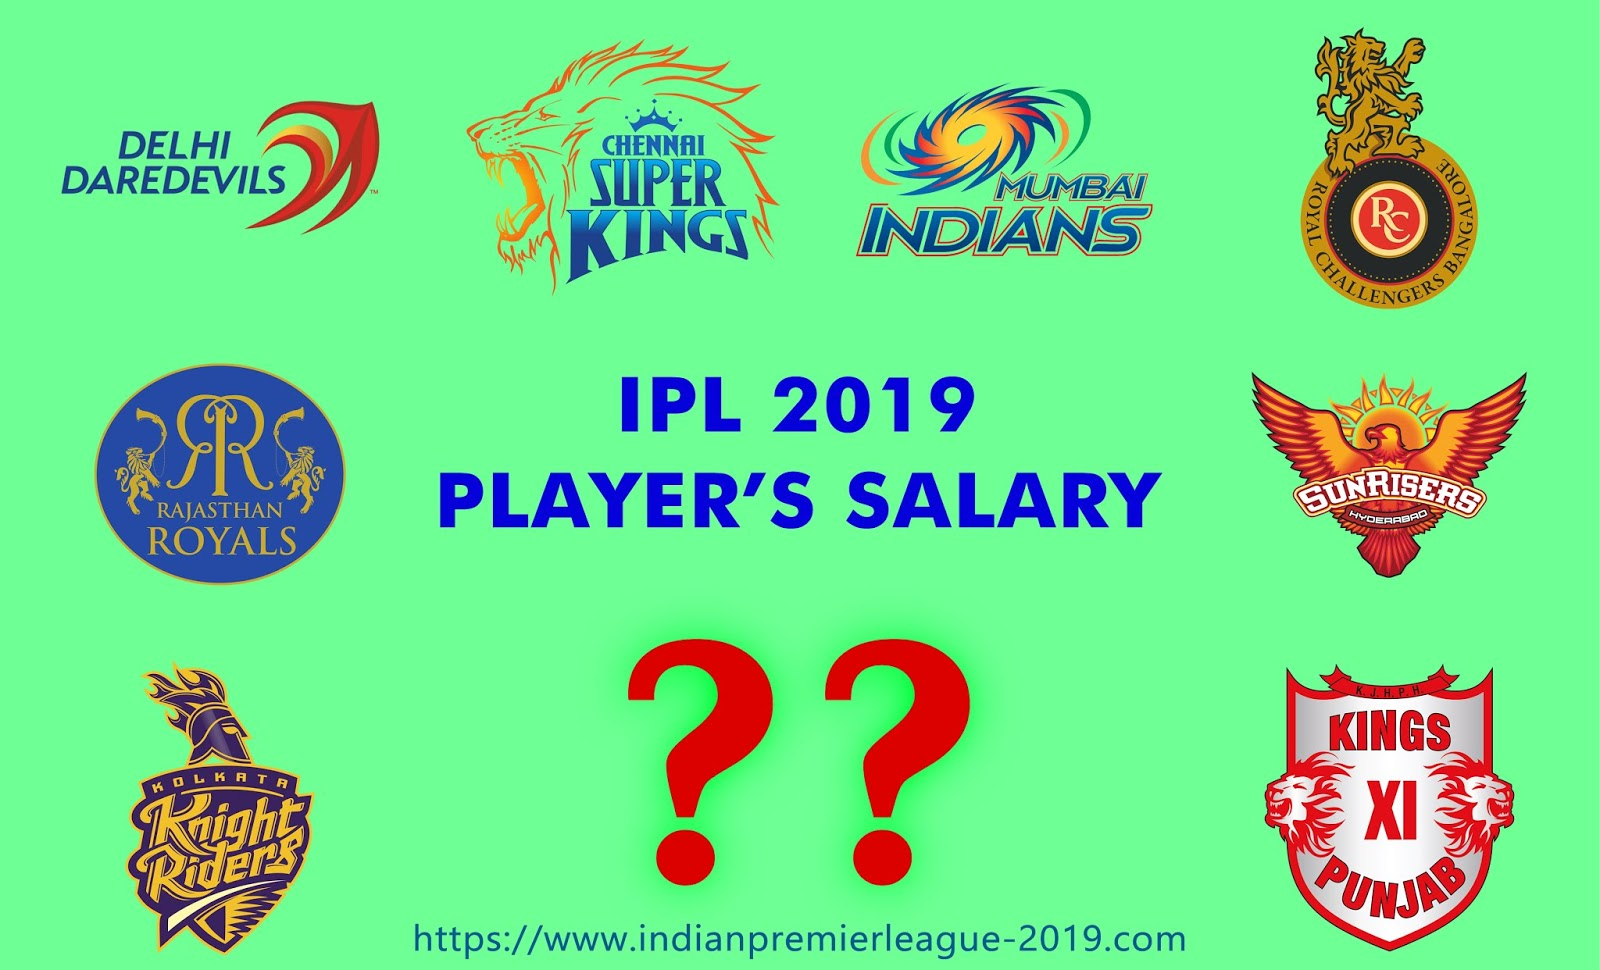 INDIAN PREMIER LEAGUE 2019, IPL 2019, IPL Auction 2019, IPL Auctions 2019, IPL Squad list 2019, Latest, IPL Players Salary